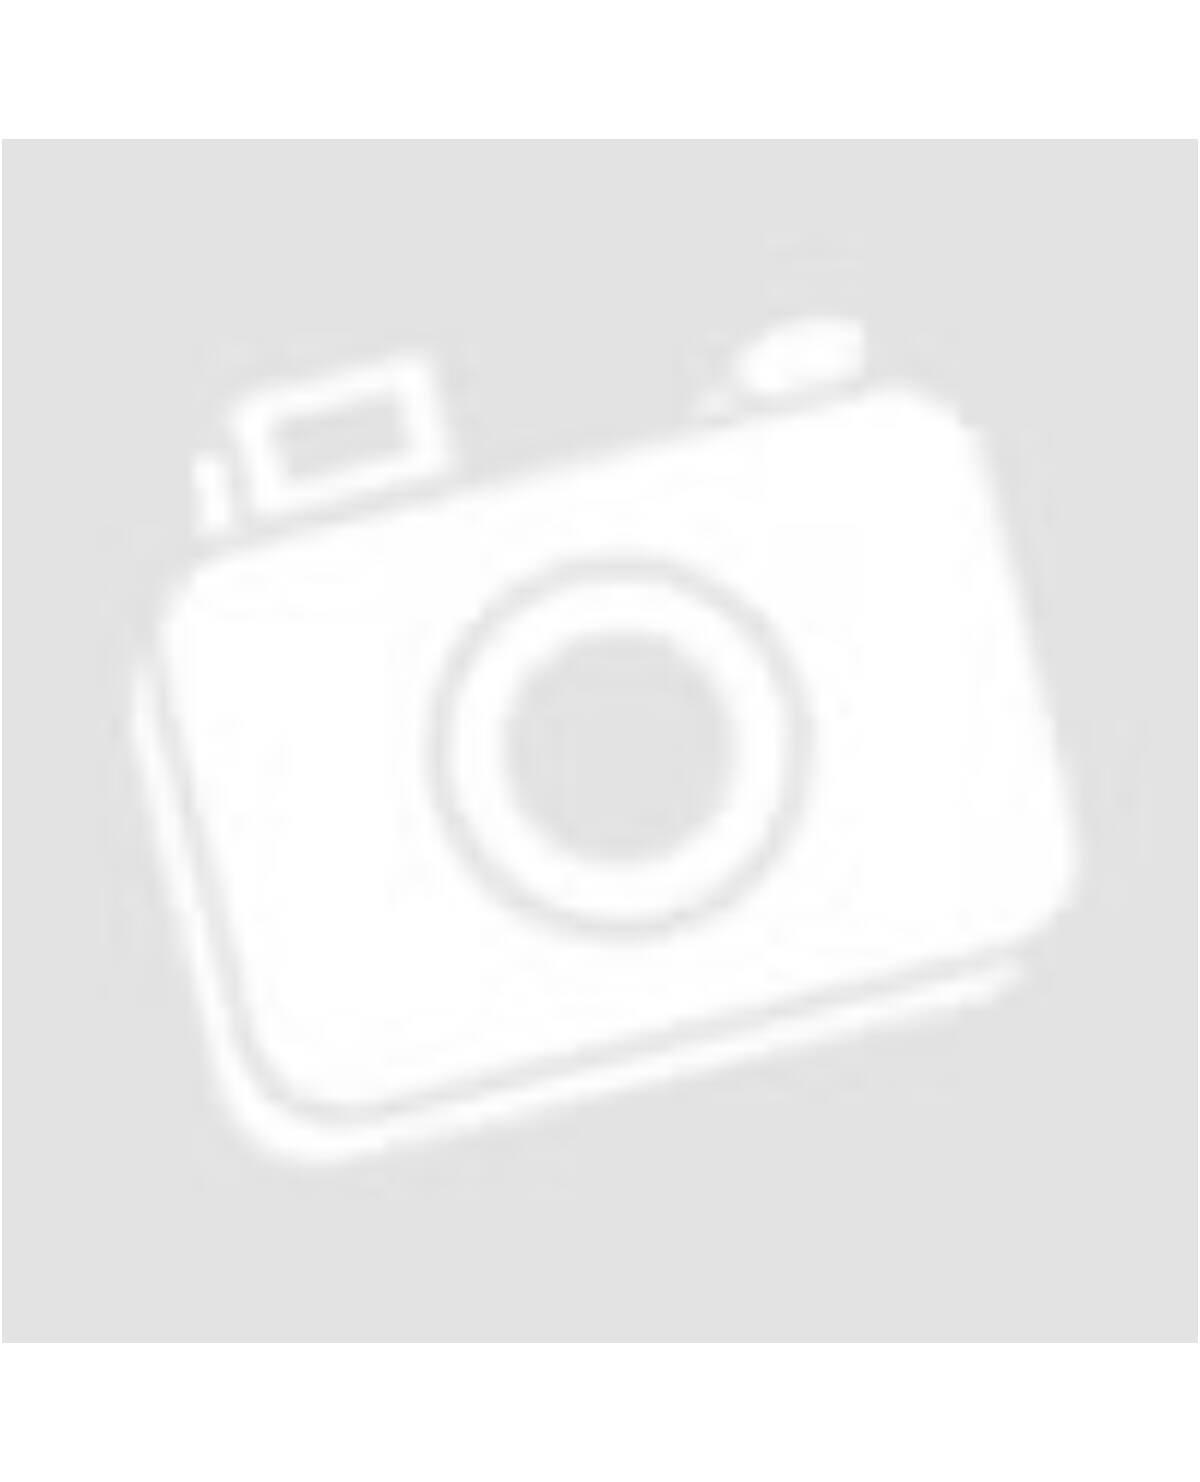 Radics Peti Nem lopott női póló